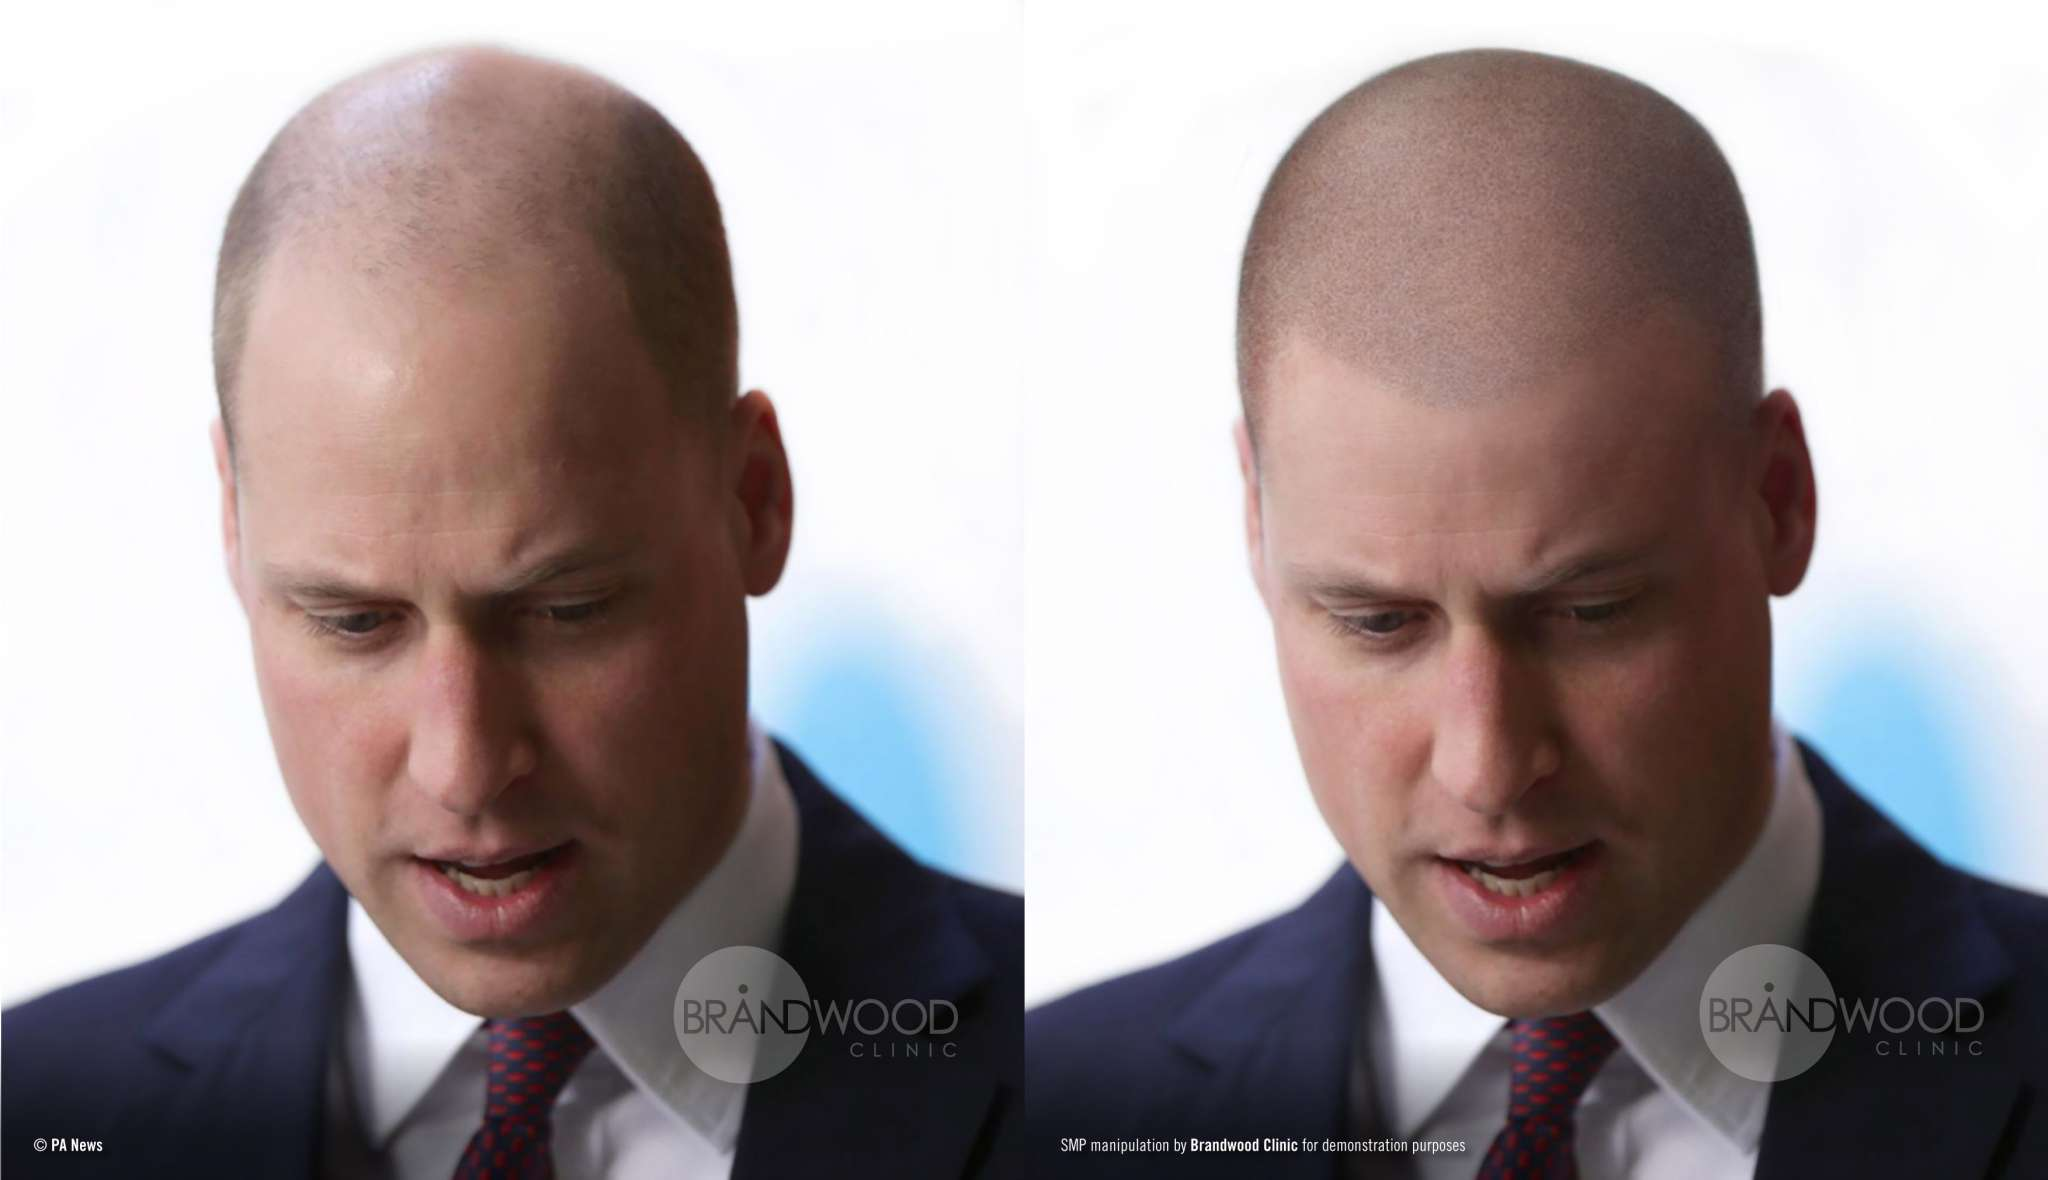 Prince William, hair loss, baldness, scalp micropigmentation